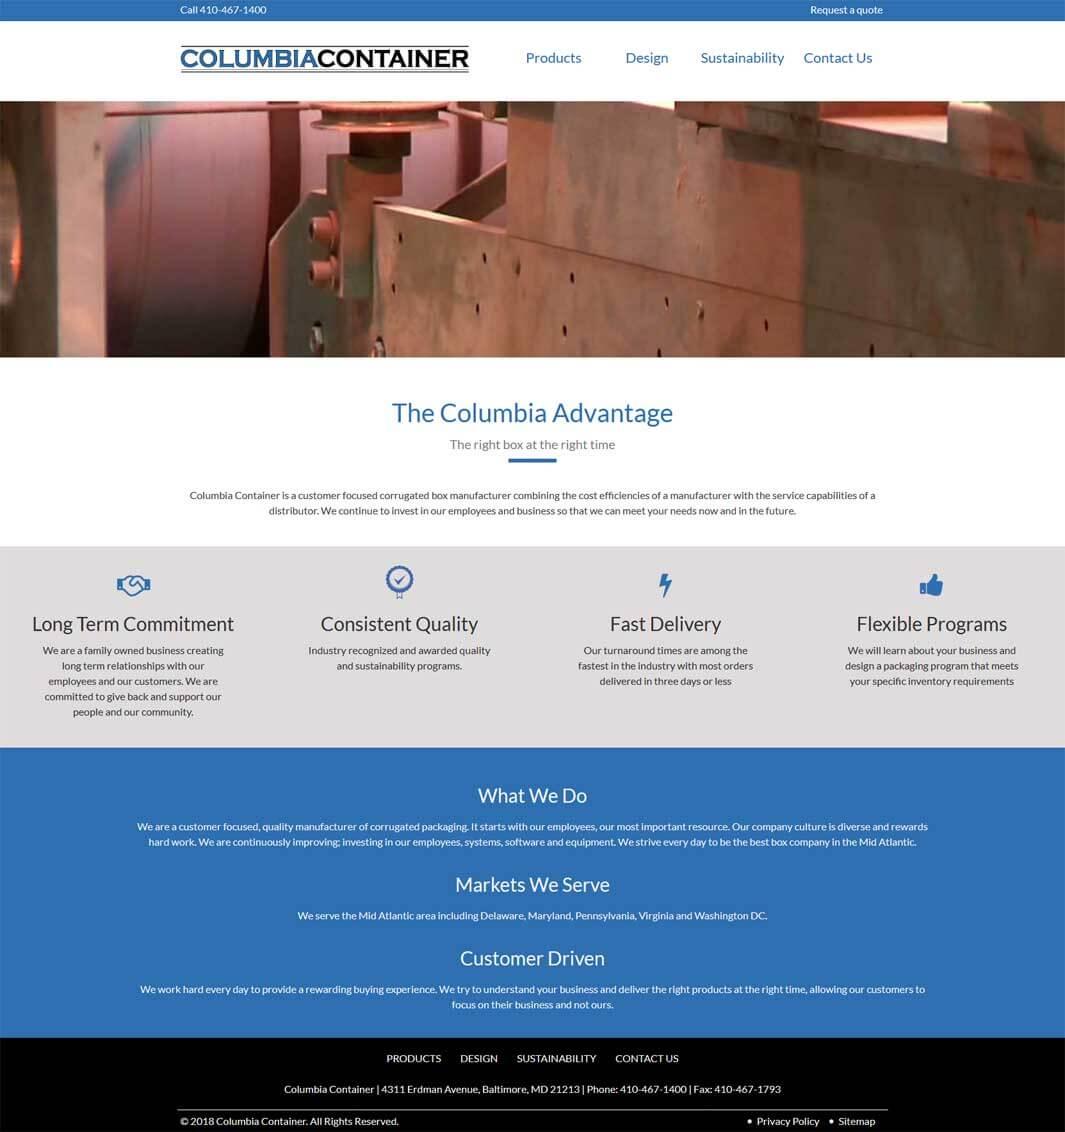 Columbia Container